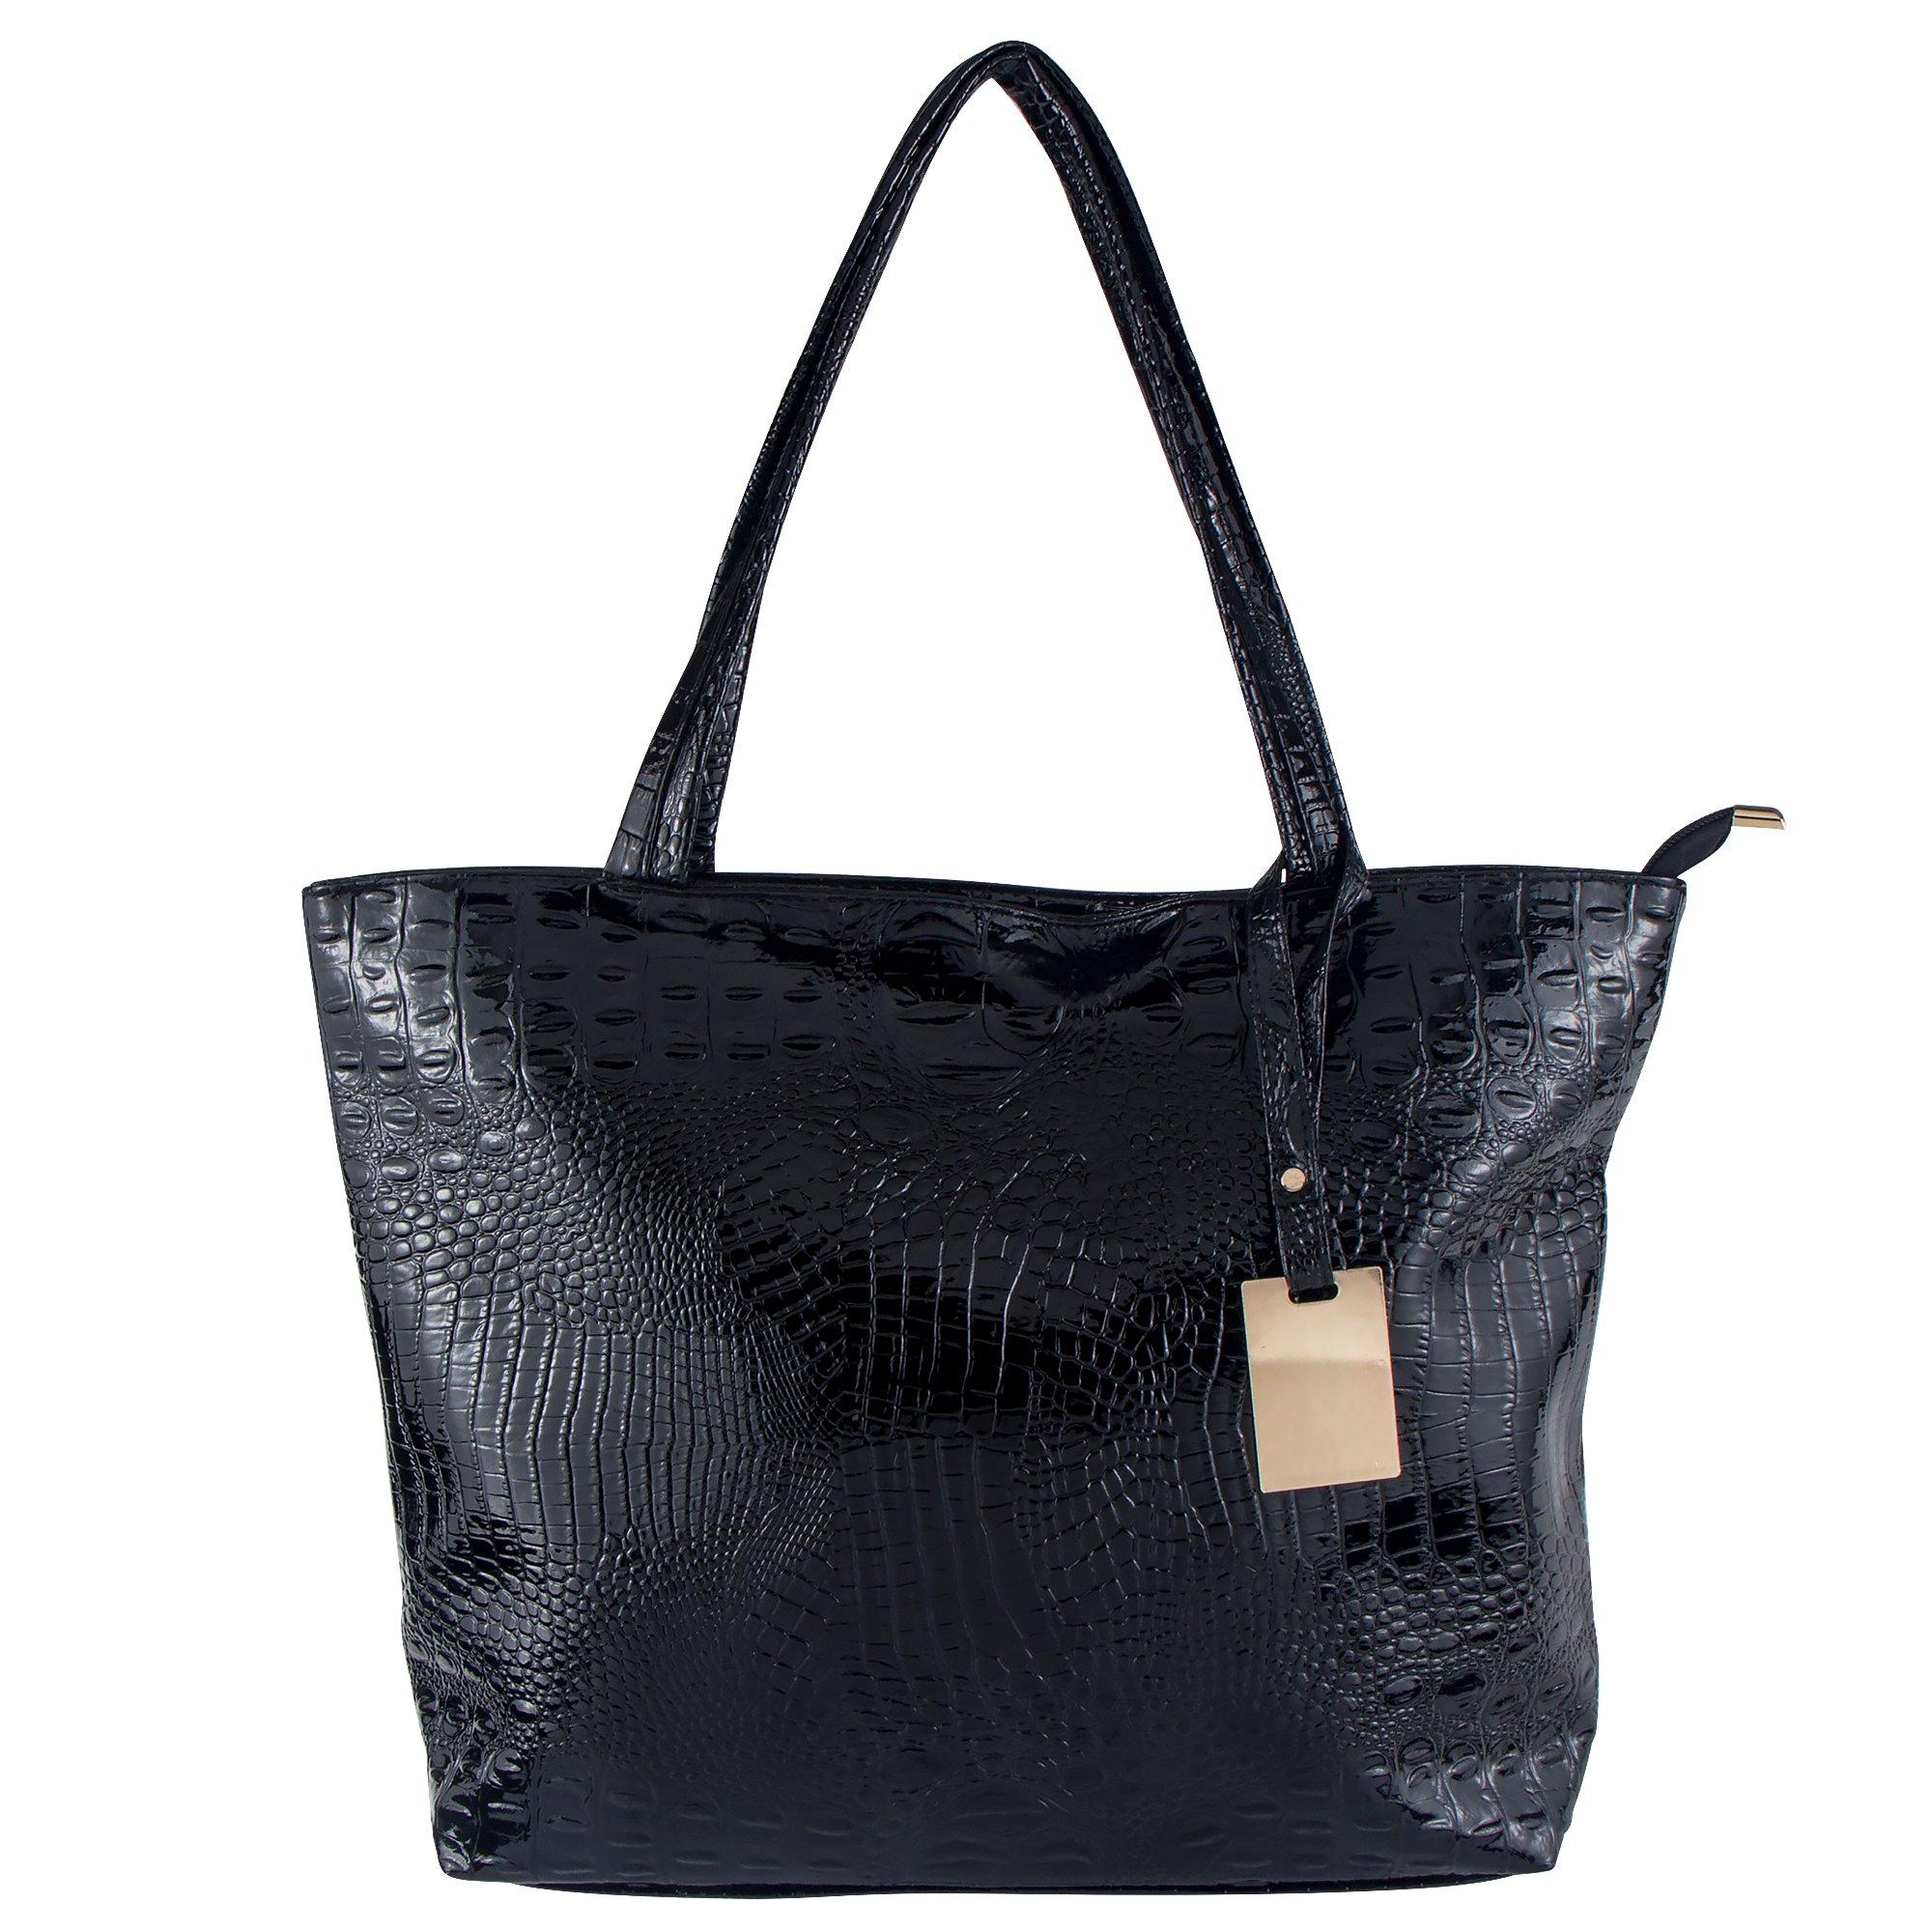 Bagood Womens Crocodile Pattern PU Leather Casual Shopping Handbags High Capacity Shoulder Ladies Soft Bag for Wedding Bridal Prom Party Black by Bagood (Image #1)